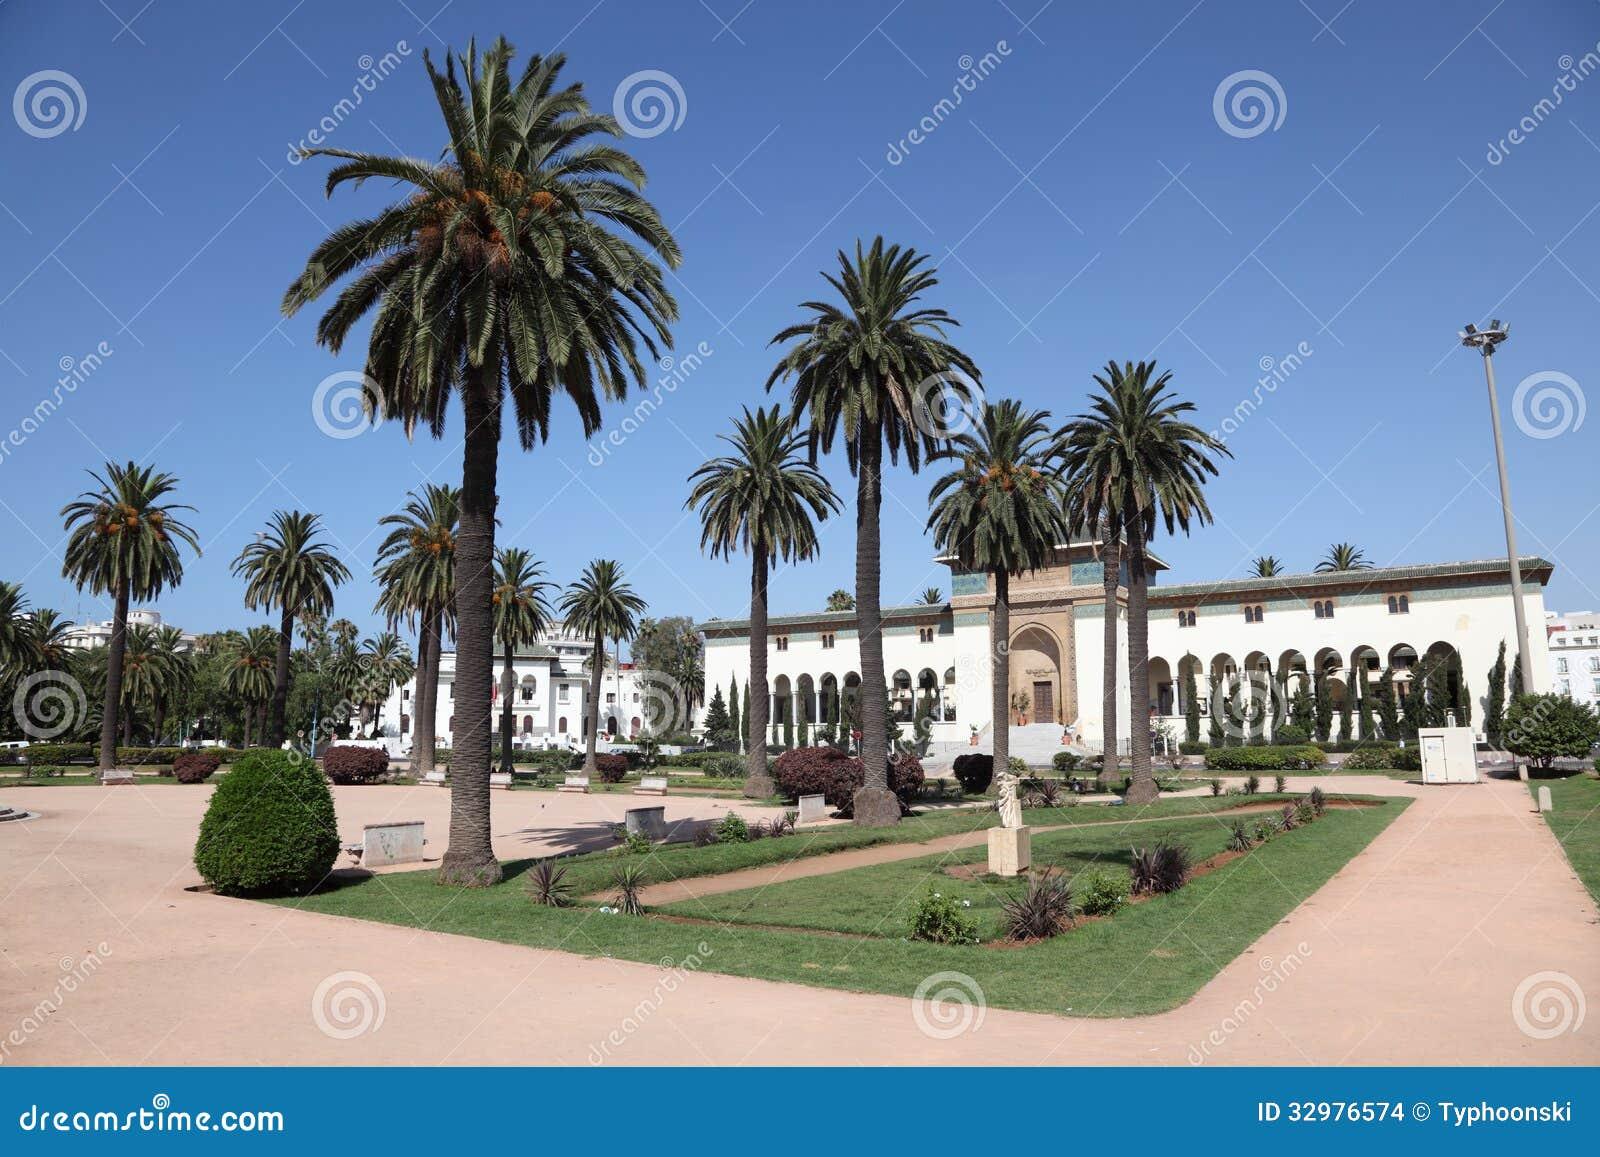 Place à Casablanca, Maroc